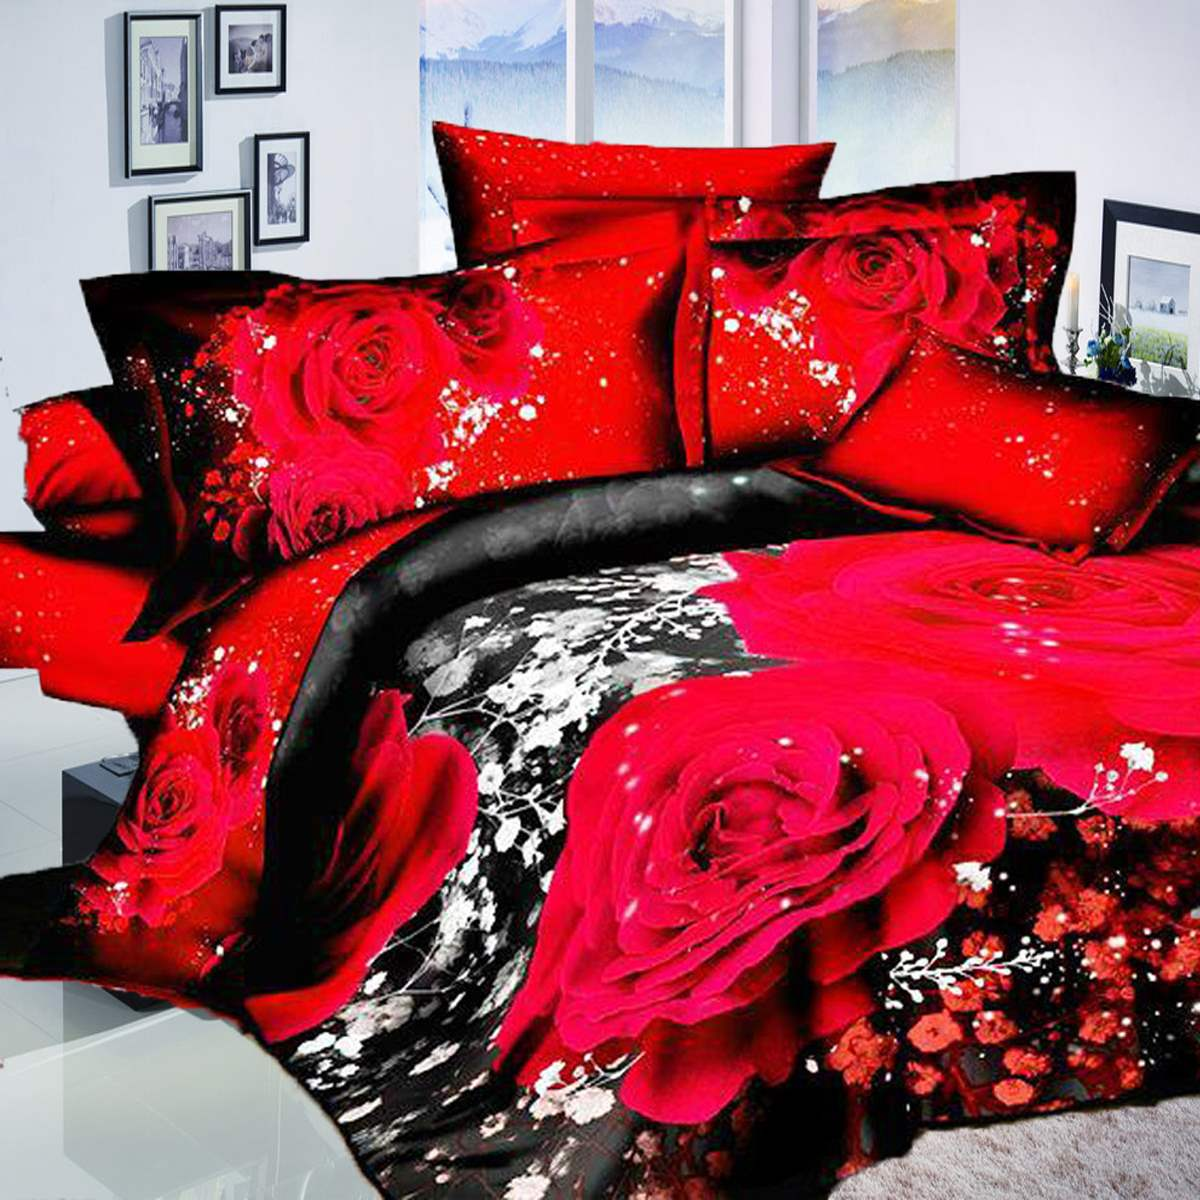 online get cheap modern red bed aliexpresscom  alibaba group - cotton red rose wedding gift pcs d flower beddin